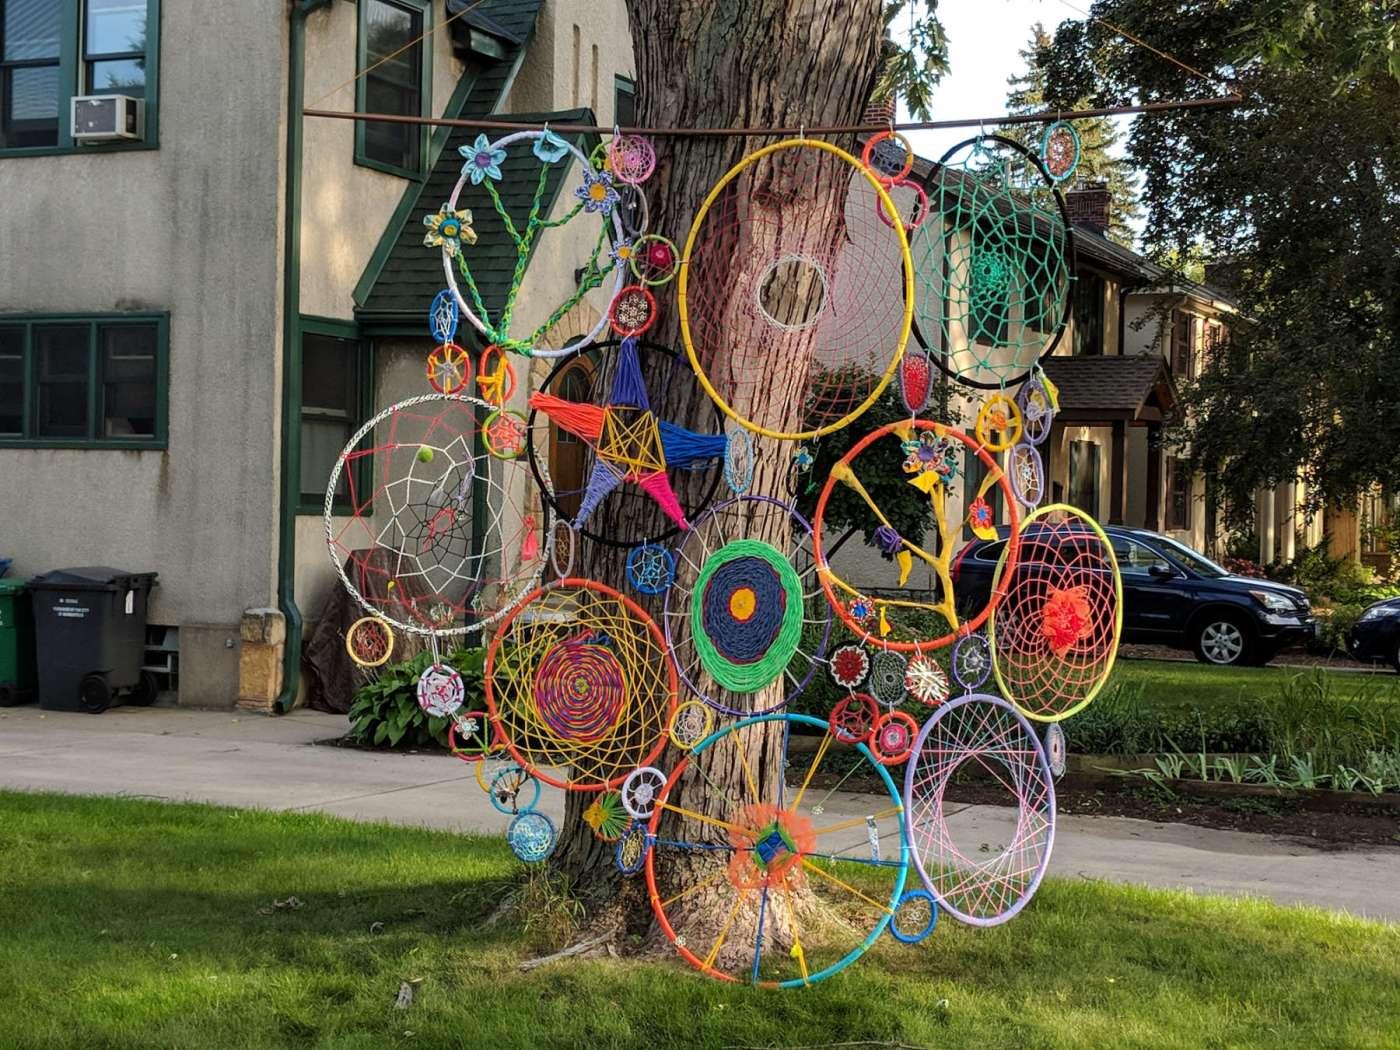 Outdoor yard art on hanging hoops against tree